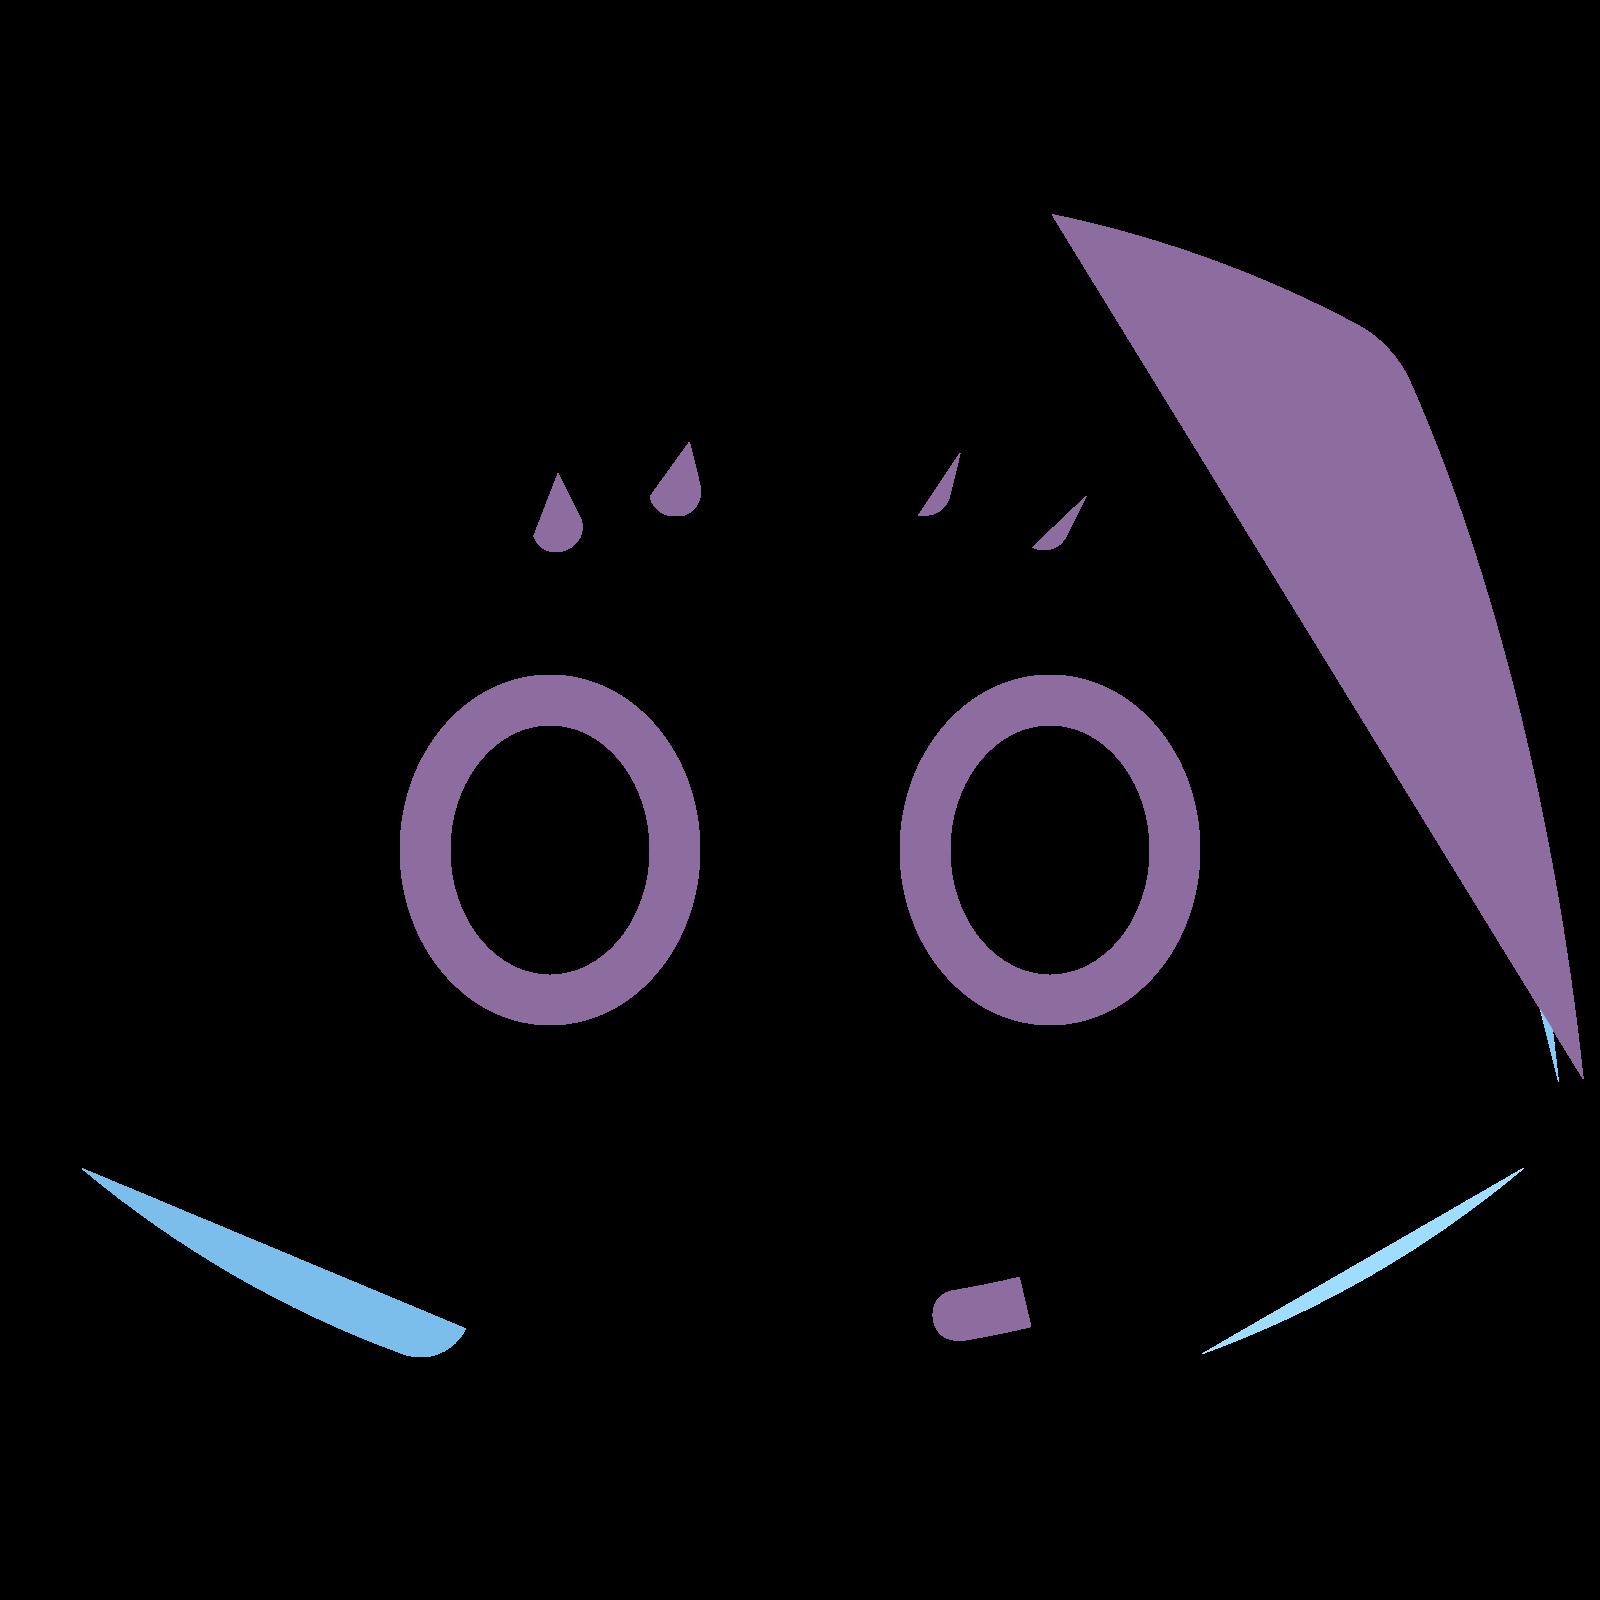 Discord simple logo icon